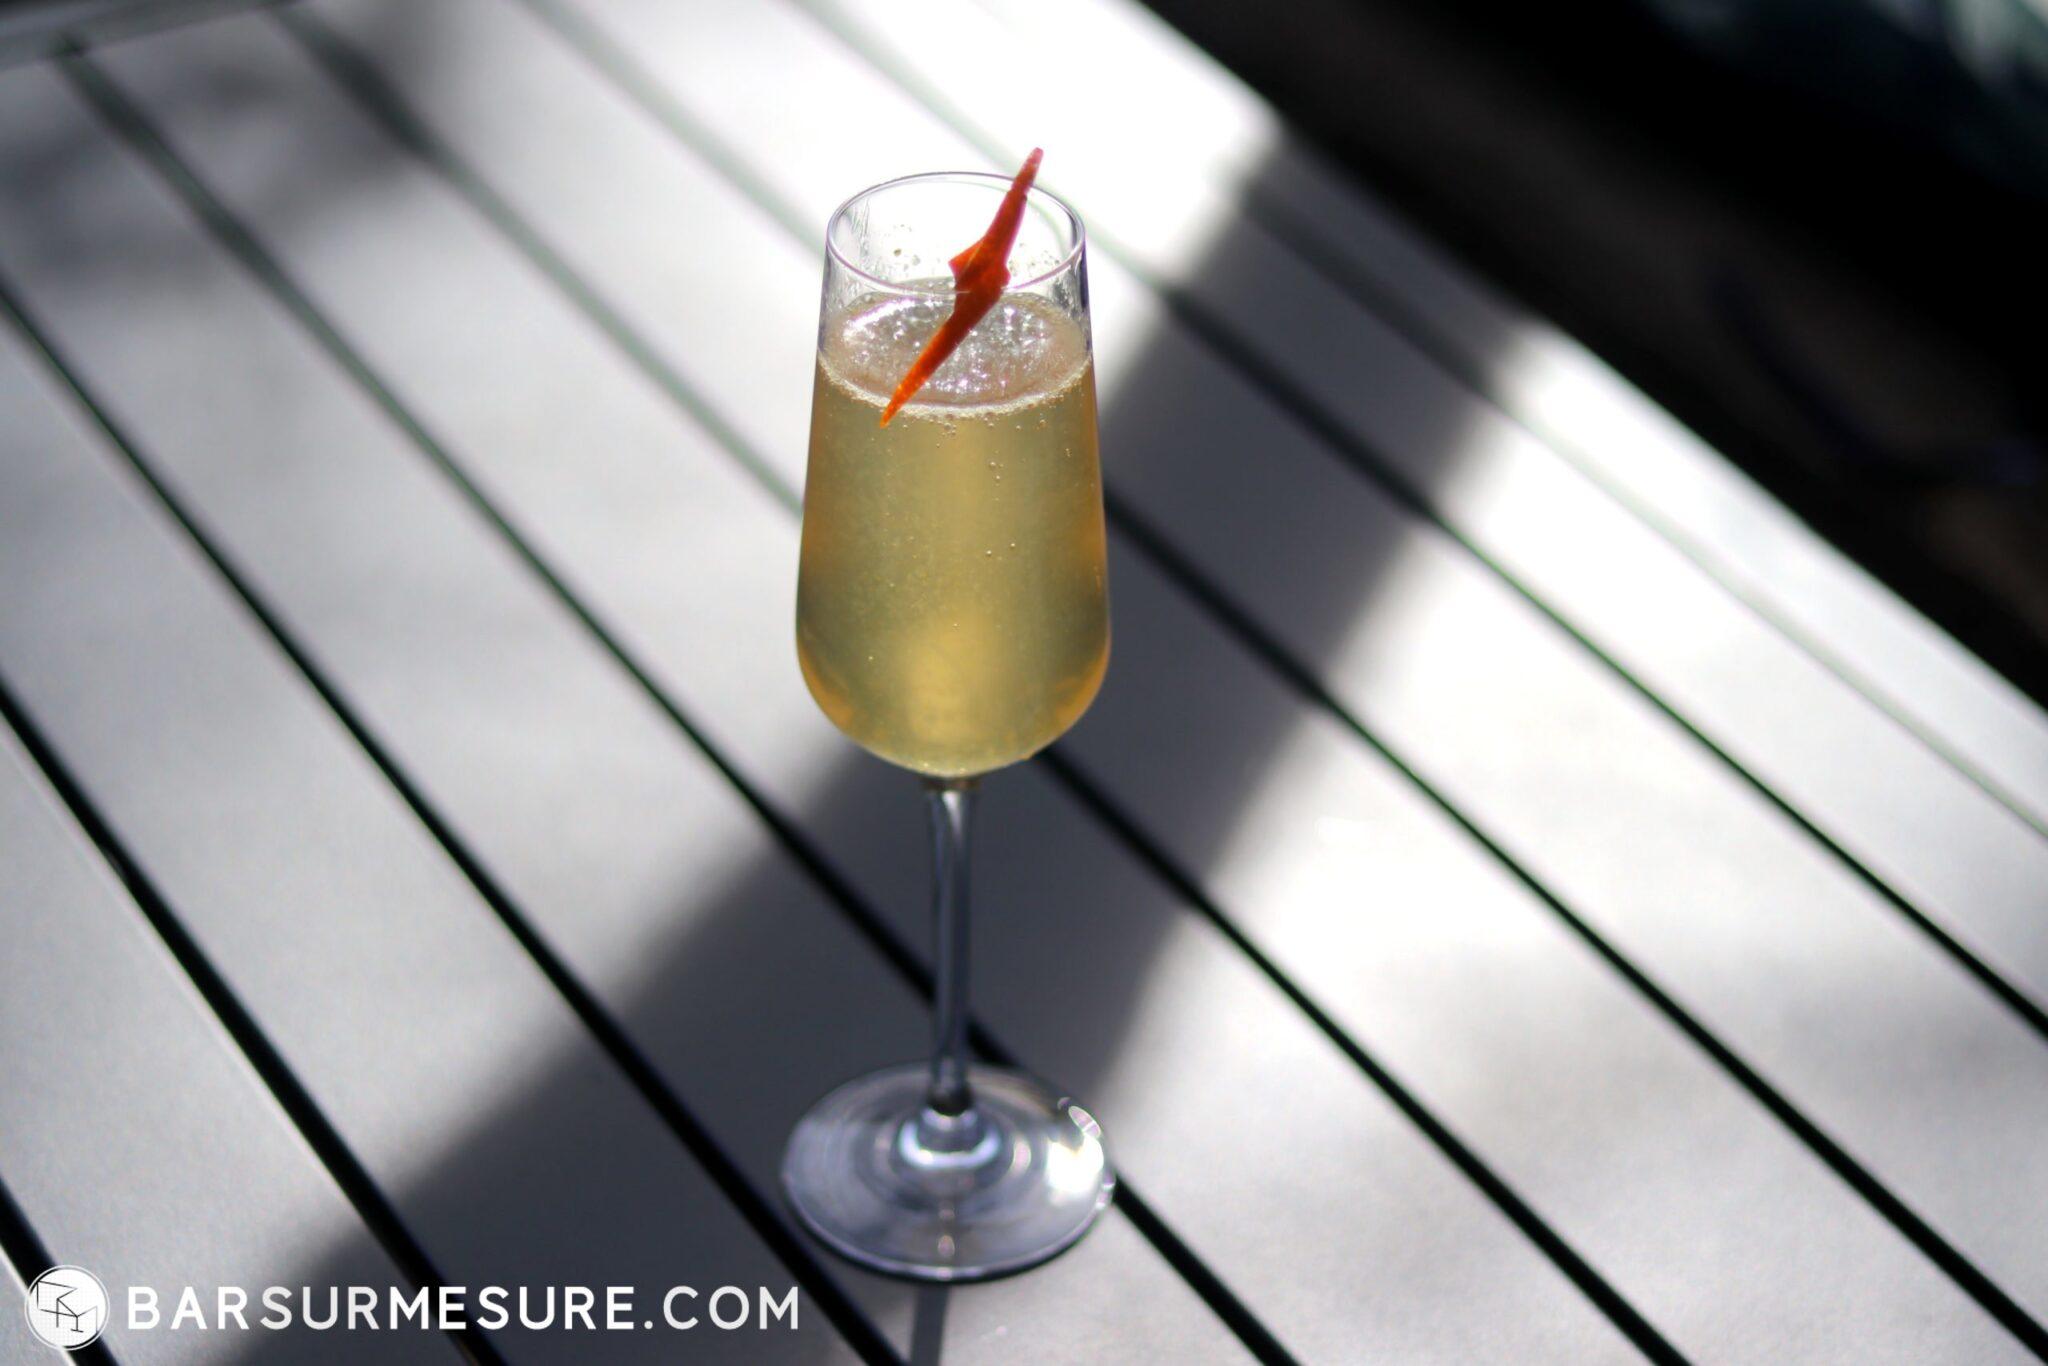 https://www.barsurmesure.com/recettes/old-fashioned-recettes/